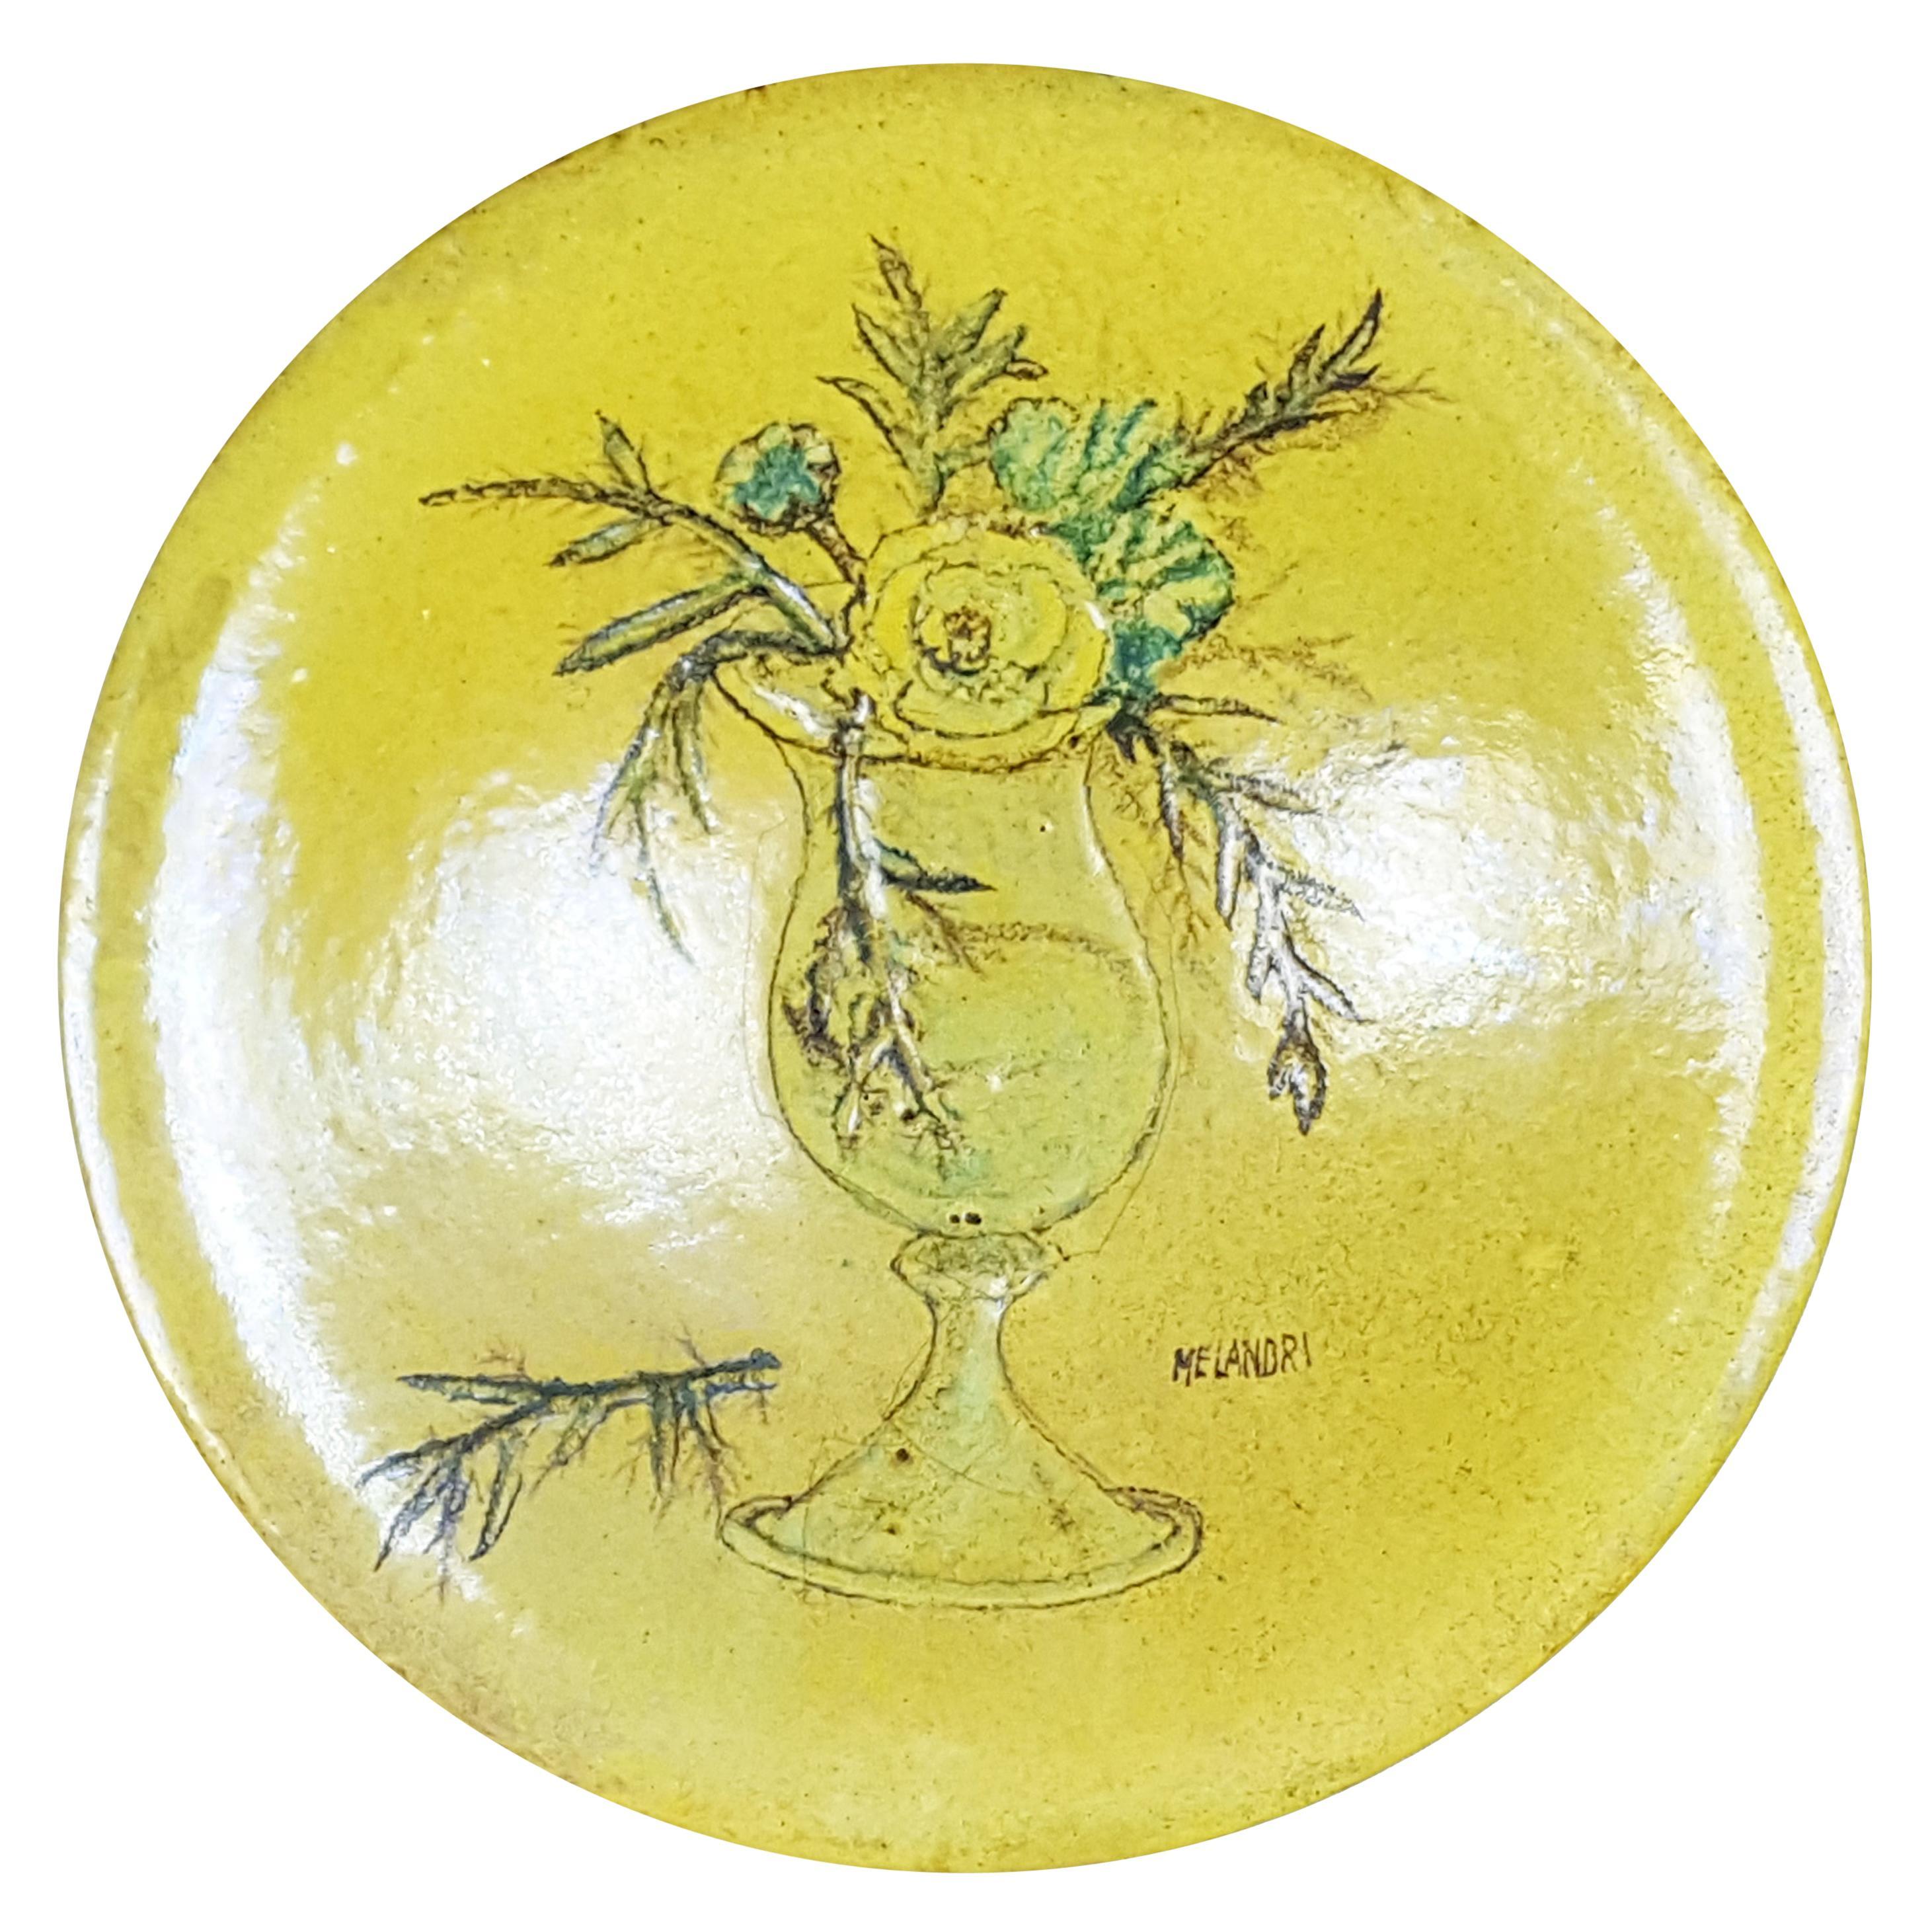 Green Ceramic Mid-Century Modern Decorative Plate by P. Melandri with Still Life